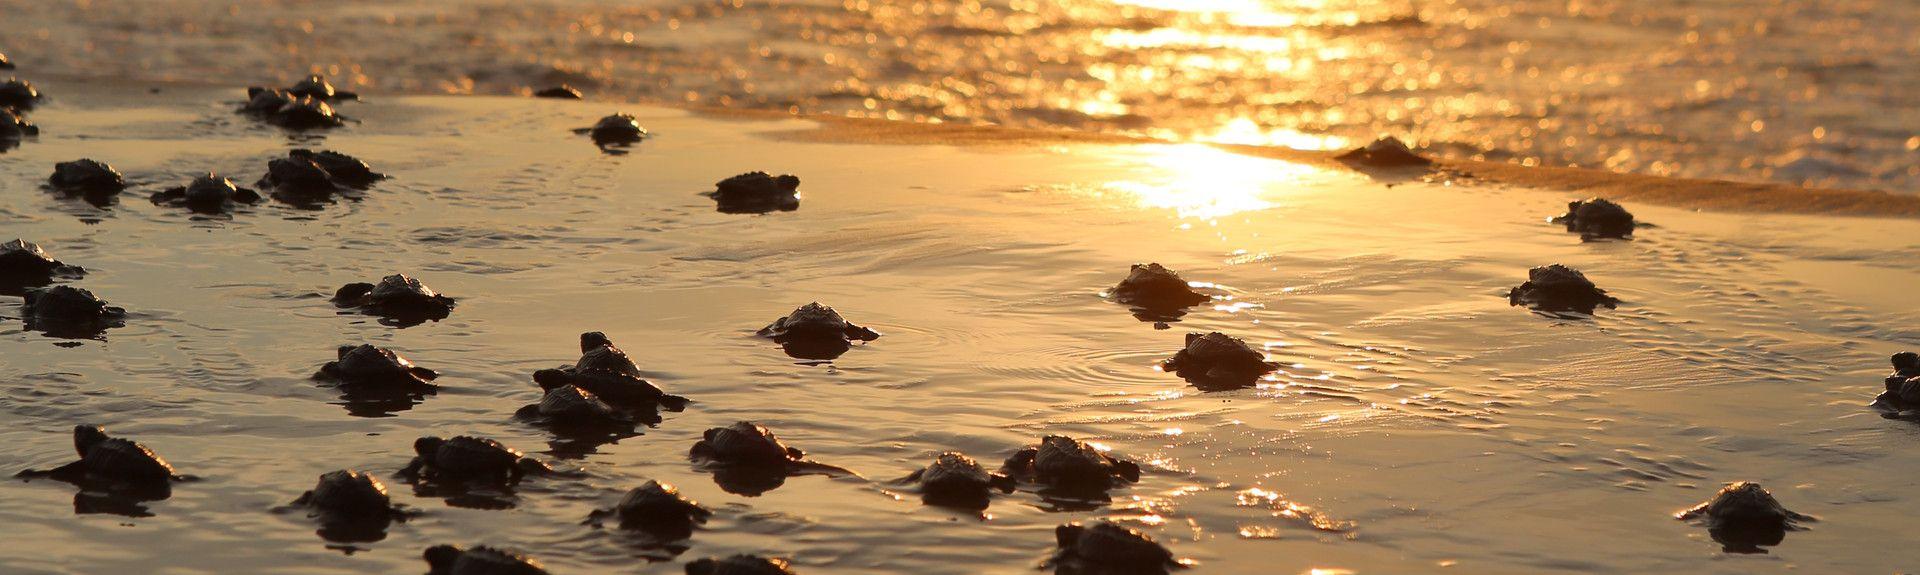 Sea Vista, South Padre Island, Texas, United States of America